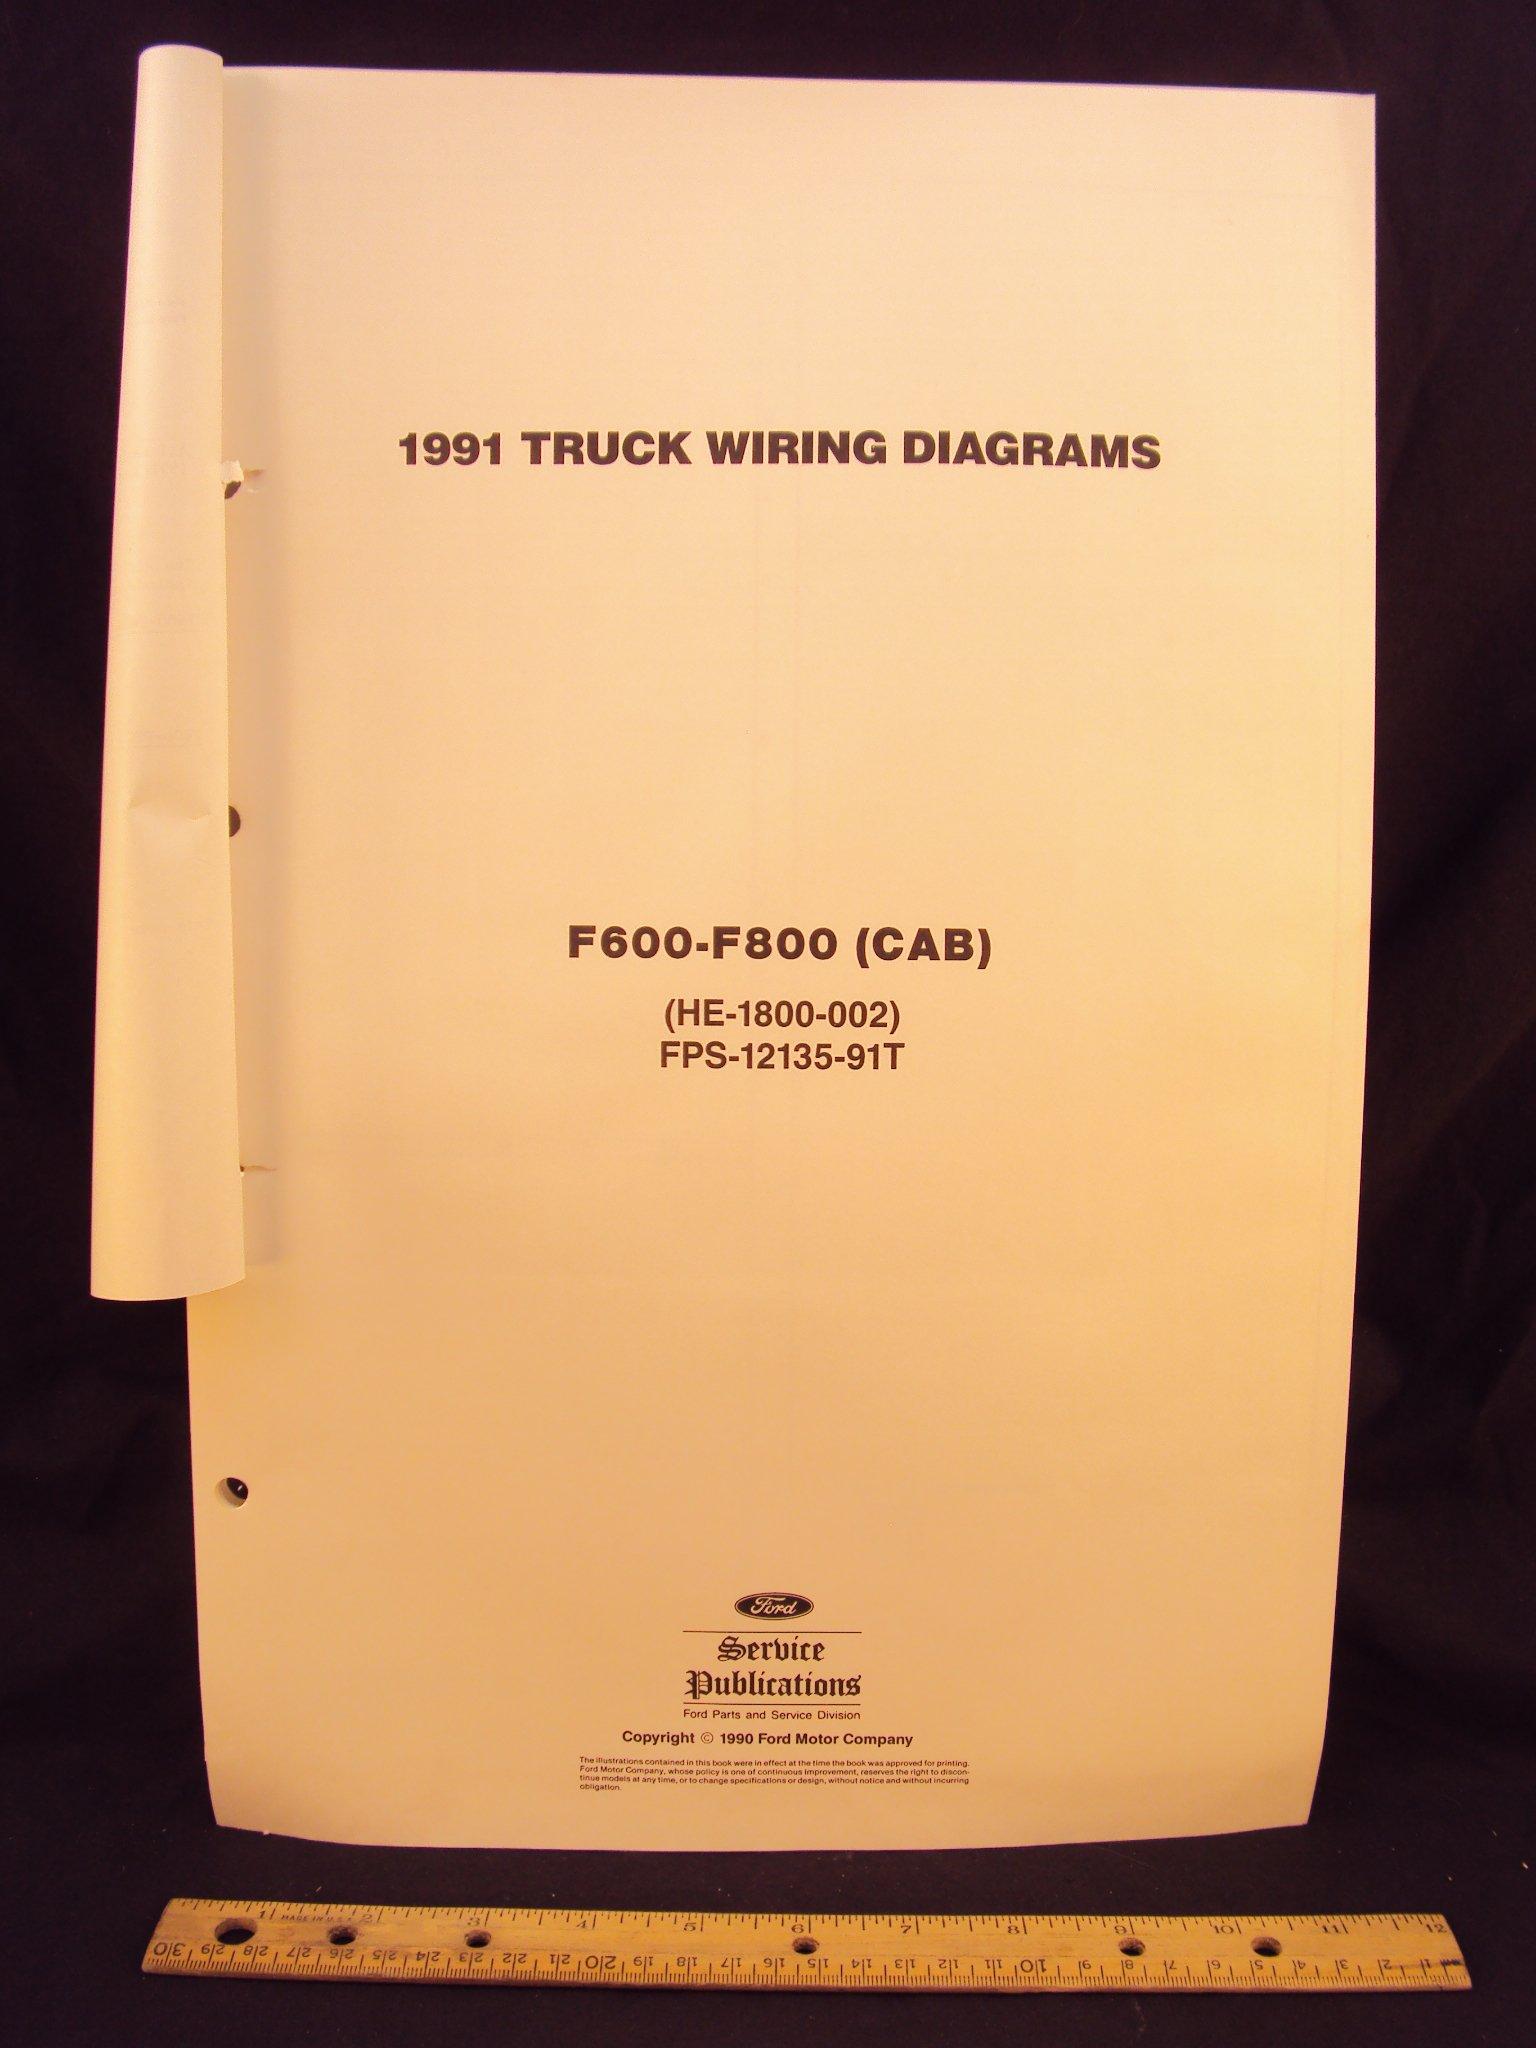 1991 ford f600 f700 f800 series cab truck electrical wiring 1991 ford f600 f700 f800 series cab truck electrical wiring diagrams schematics loose leaf 1 1990